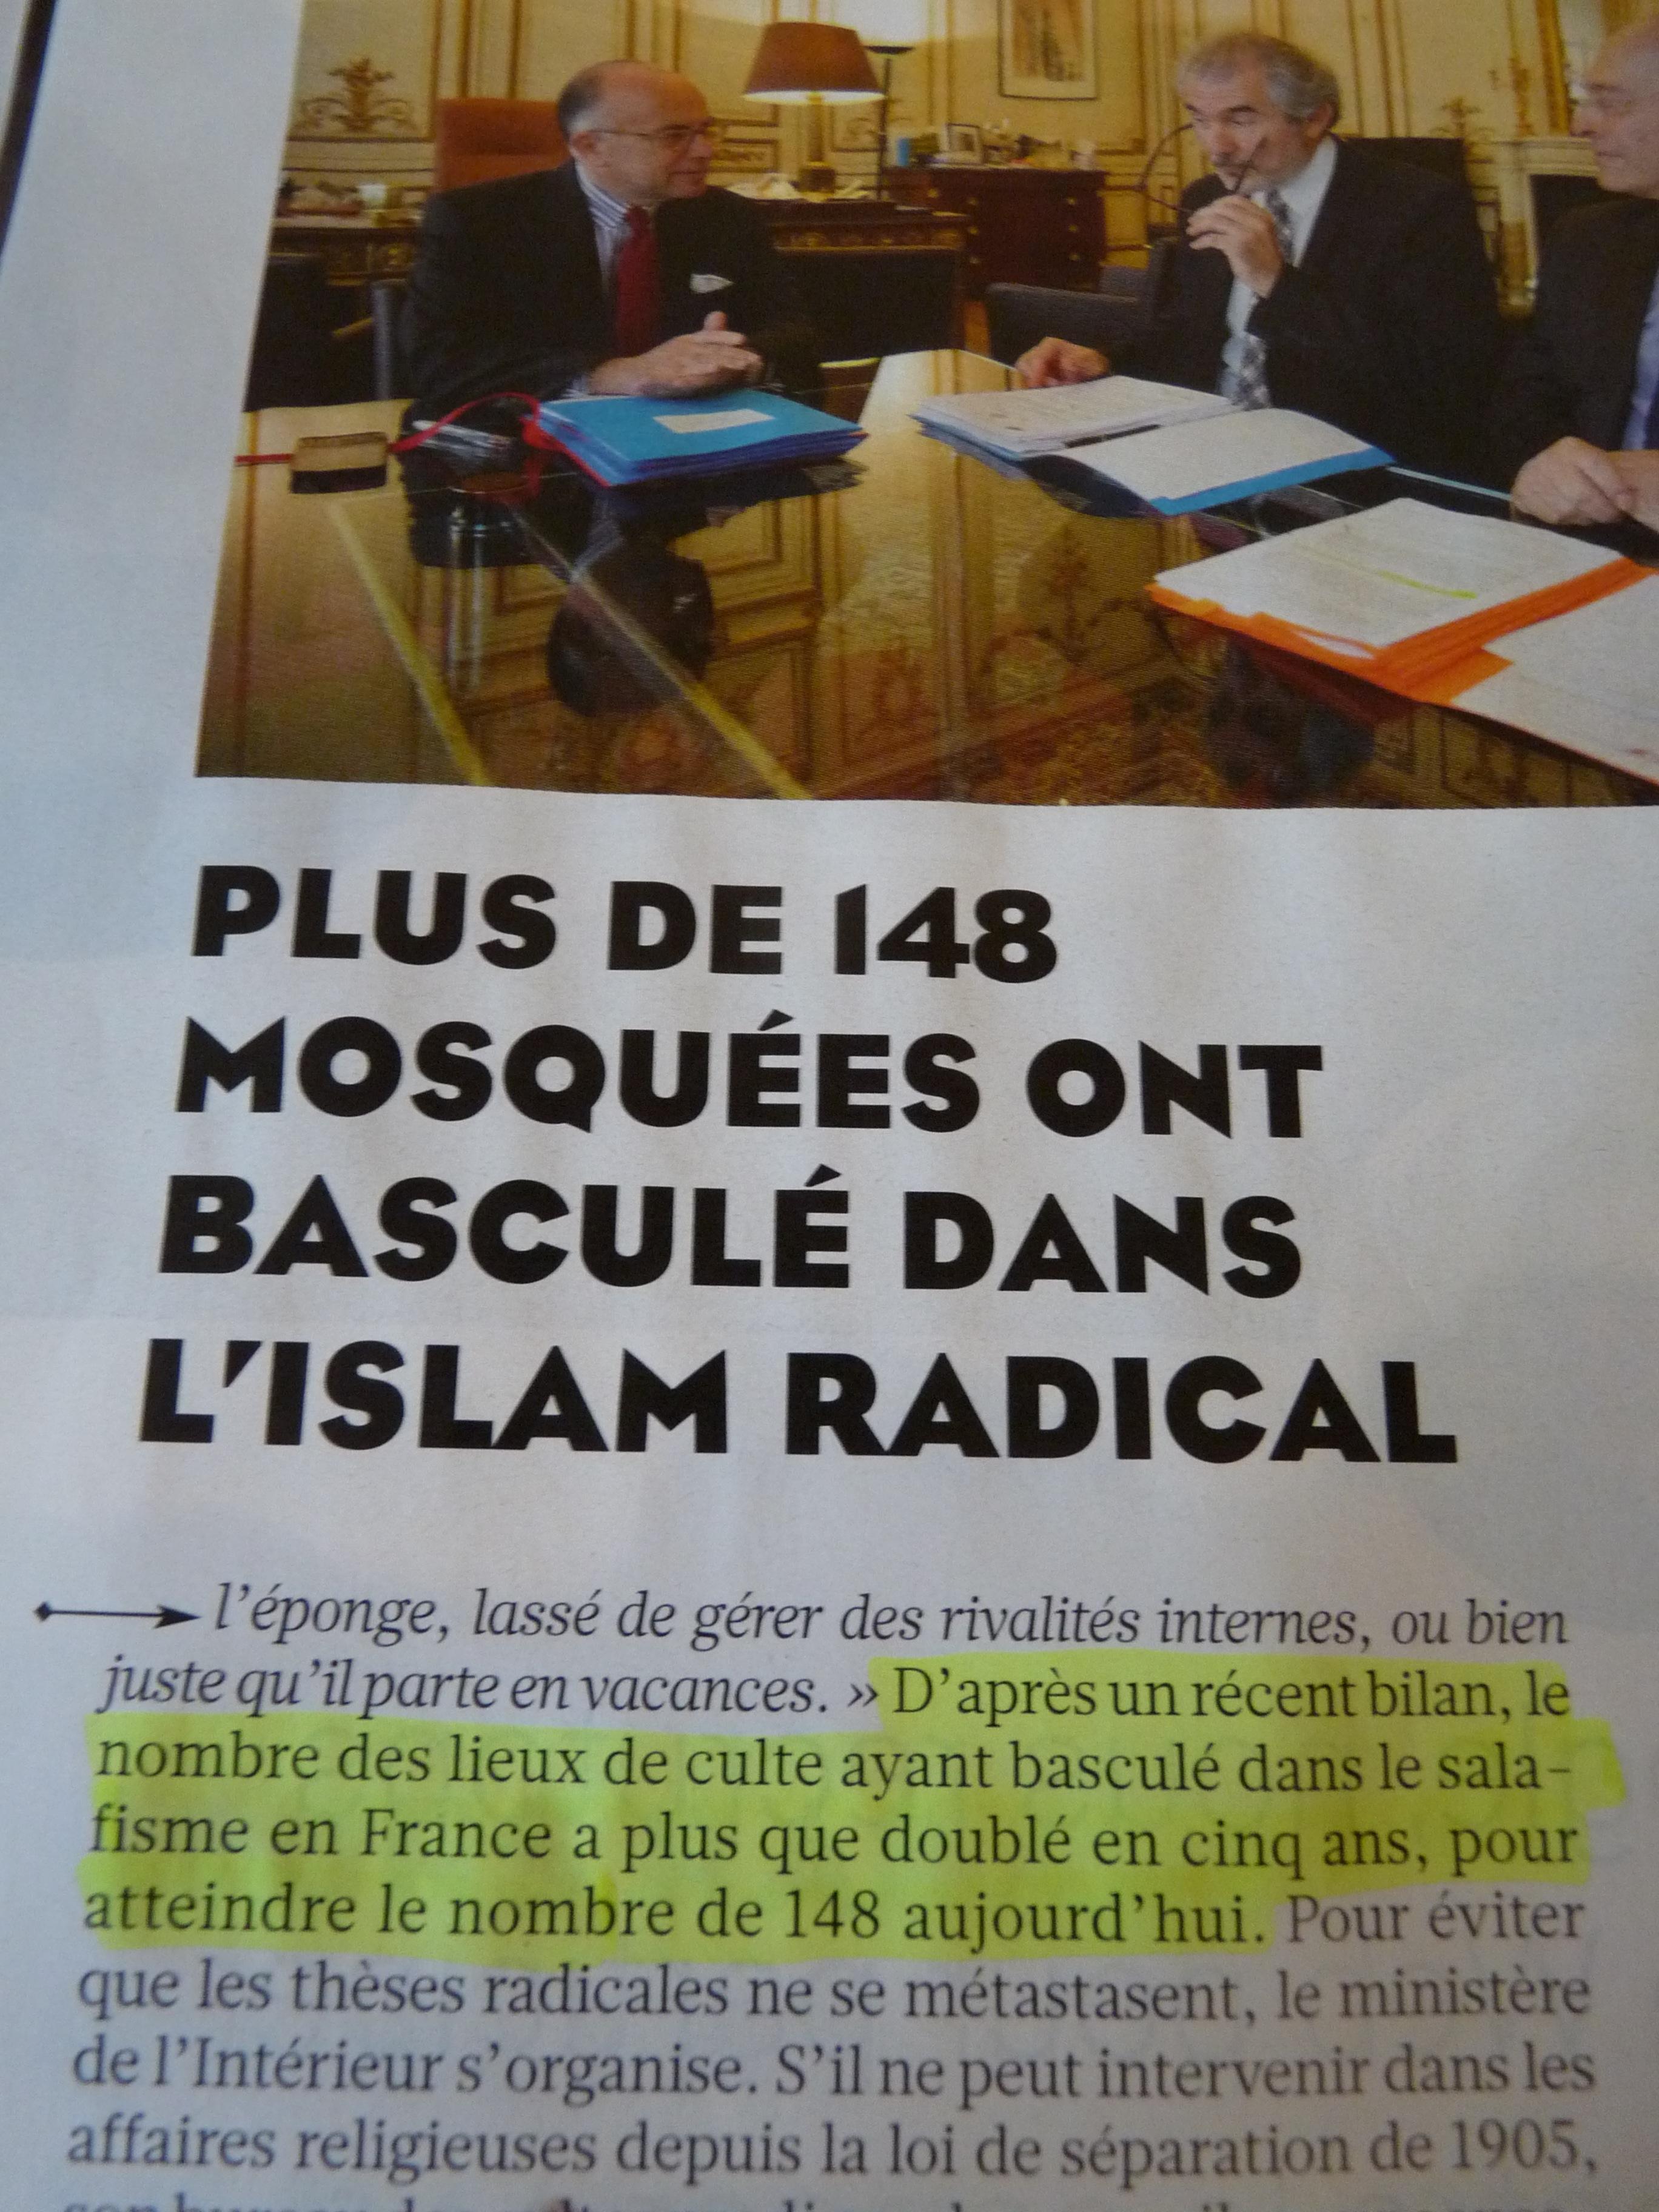 148 moquées radicales en 2015